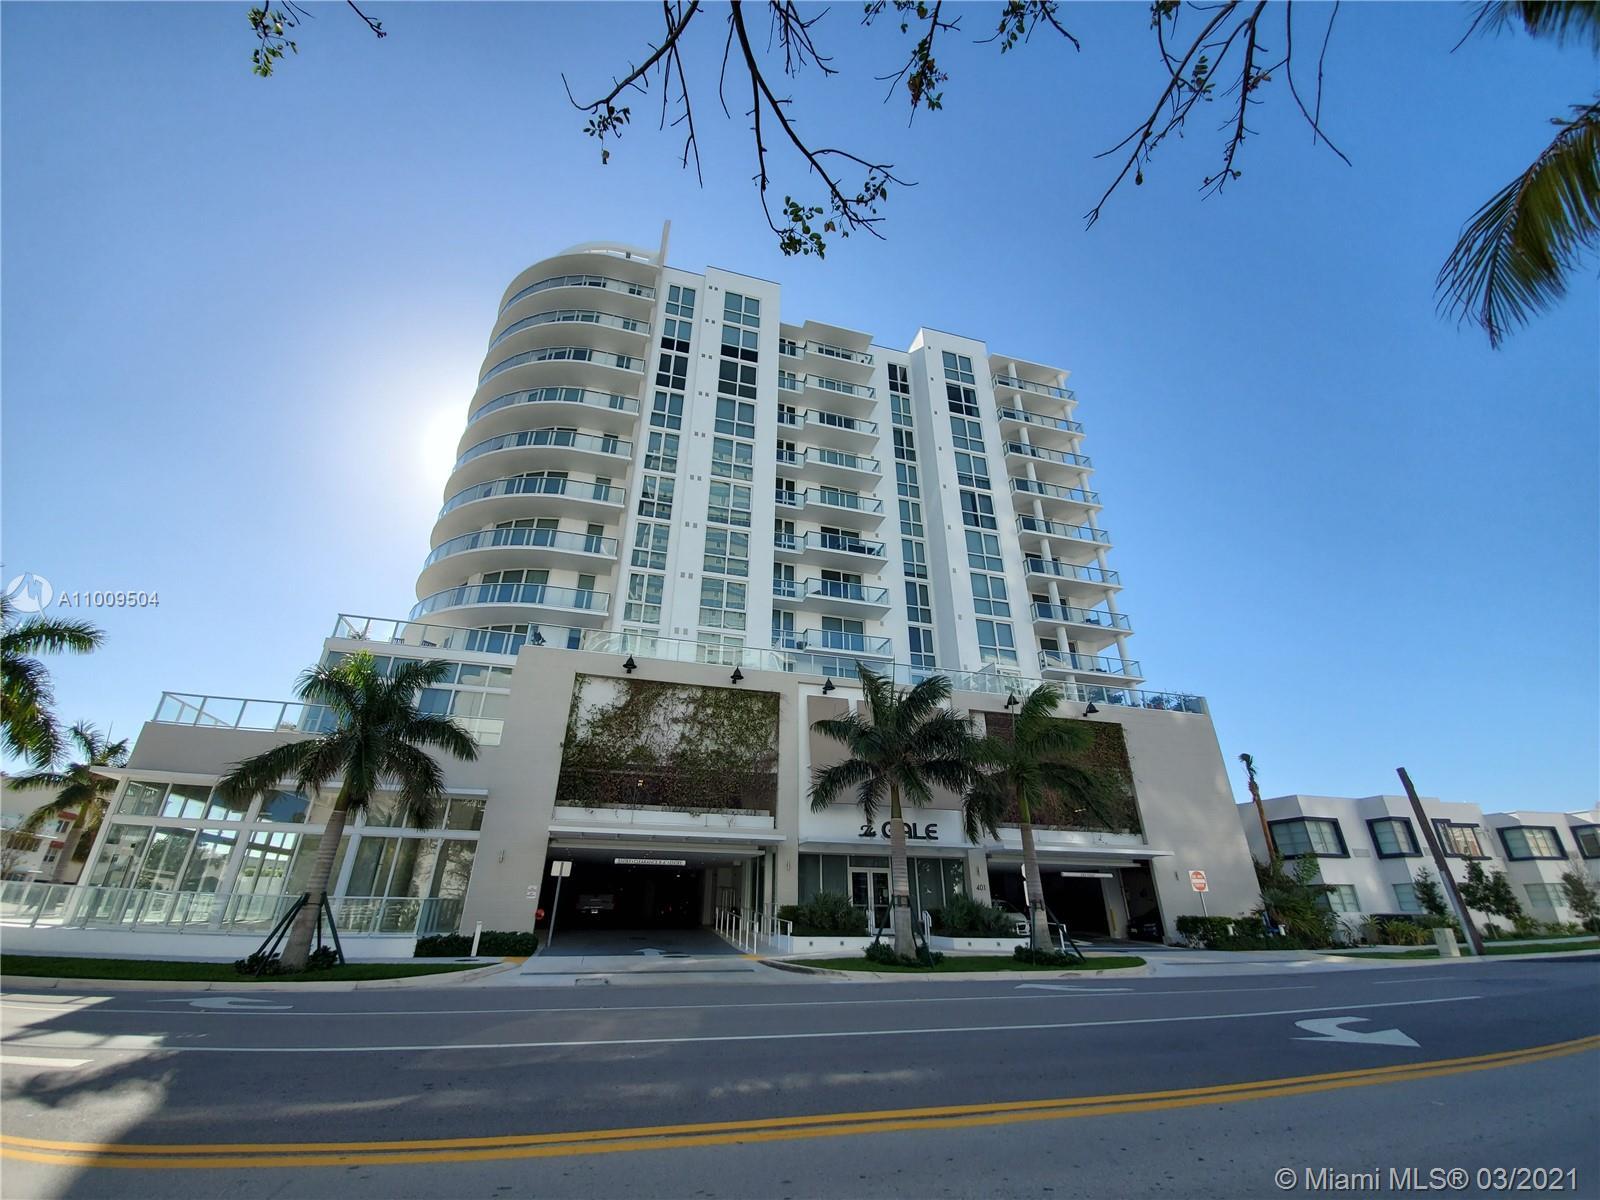 Gale Residences #1212 - 401 N Birch Rd #1212, Fort Lauderdale, FL 33304